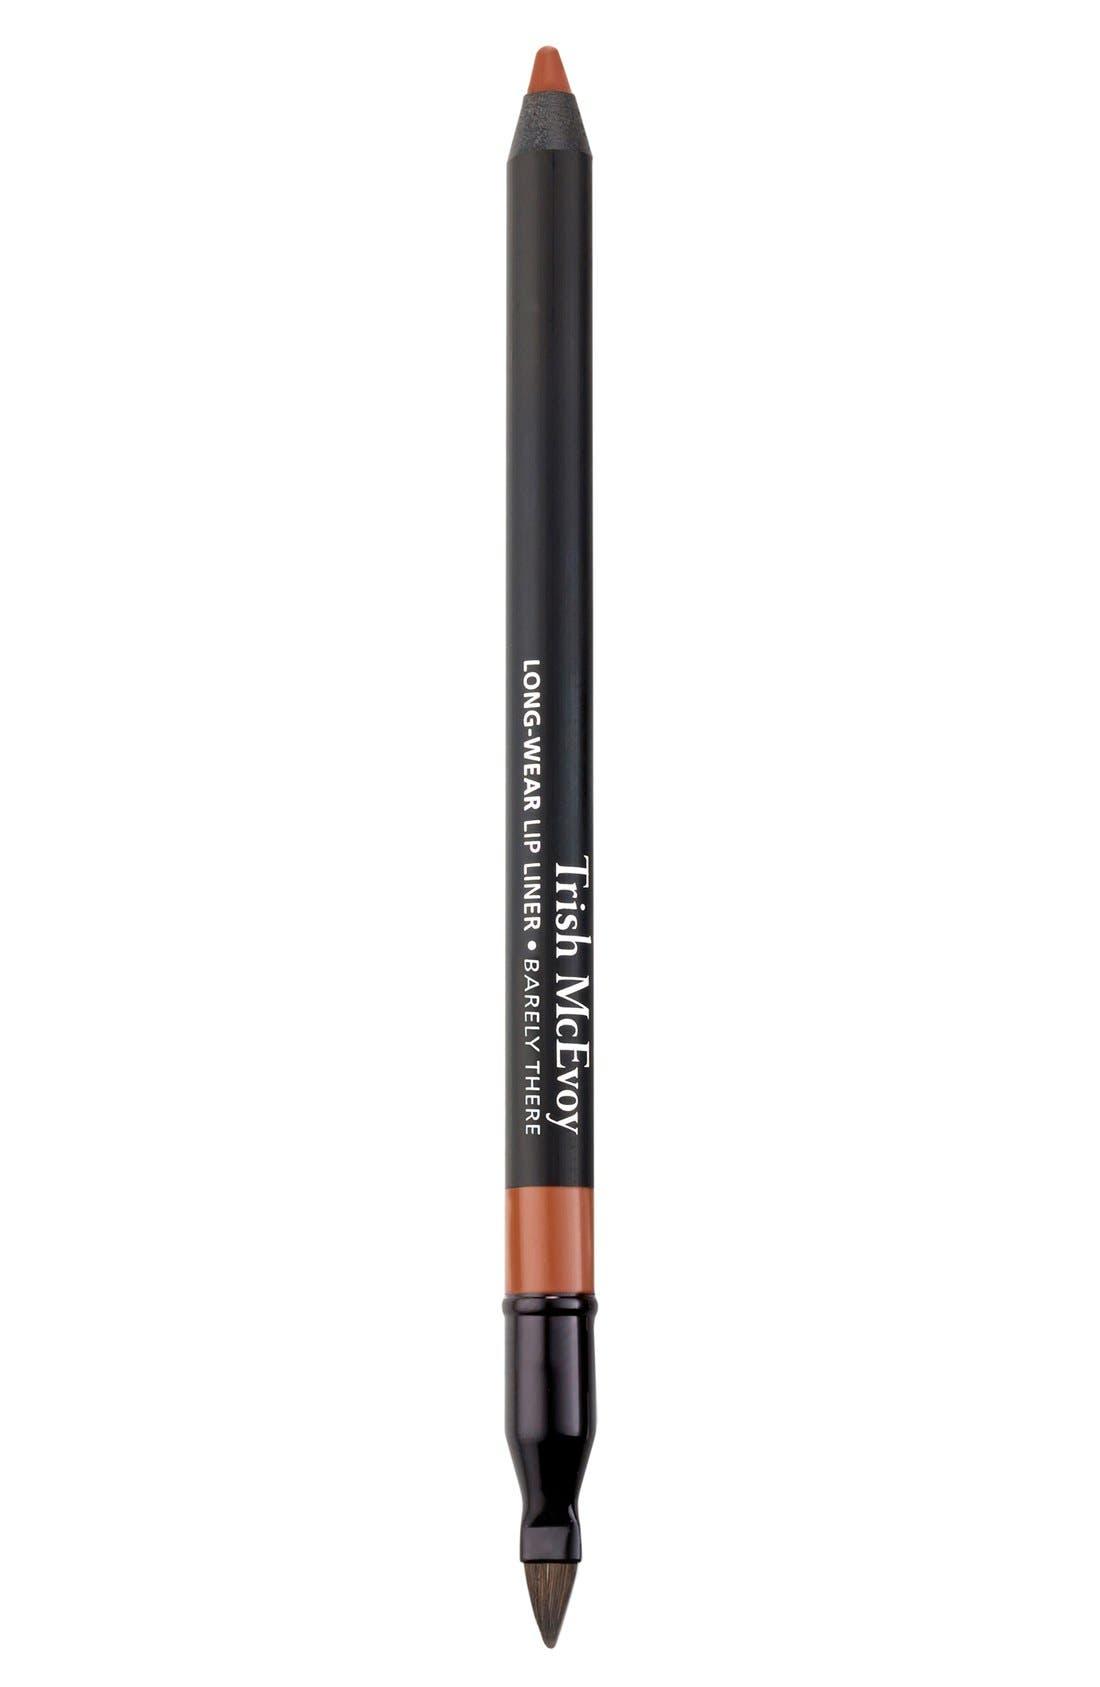 Trish McEvoy Long-Wear Lip Liner